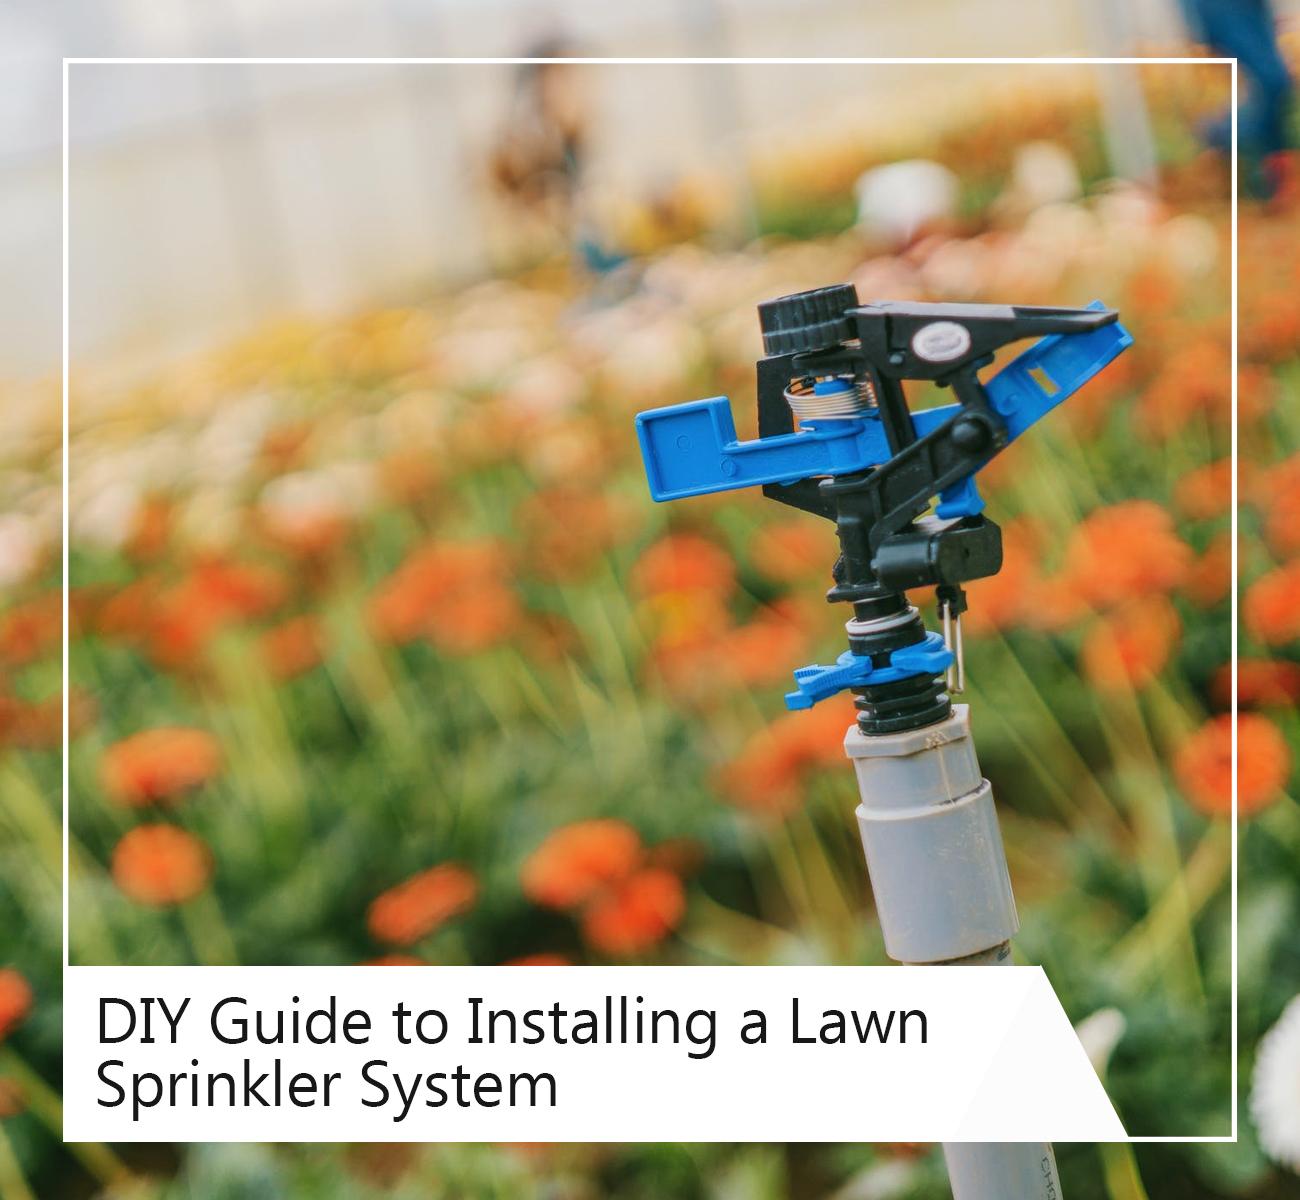 DIY Guide to Installing a Lawn Sprinkler